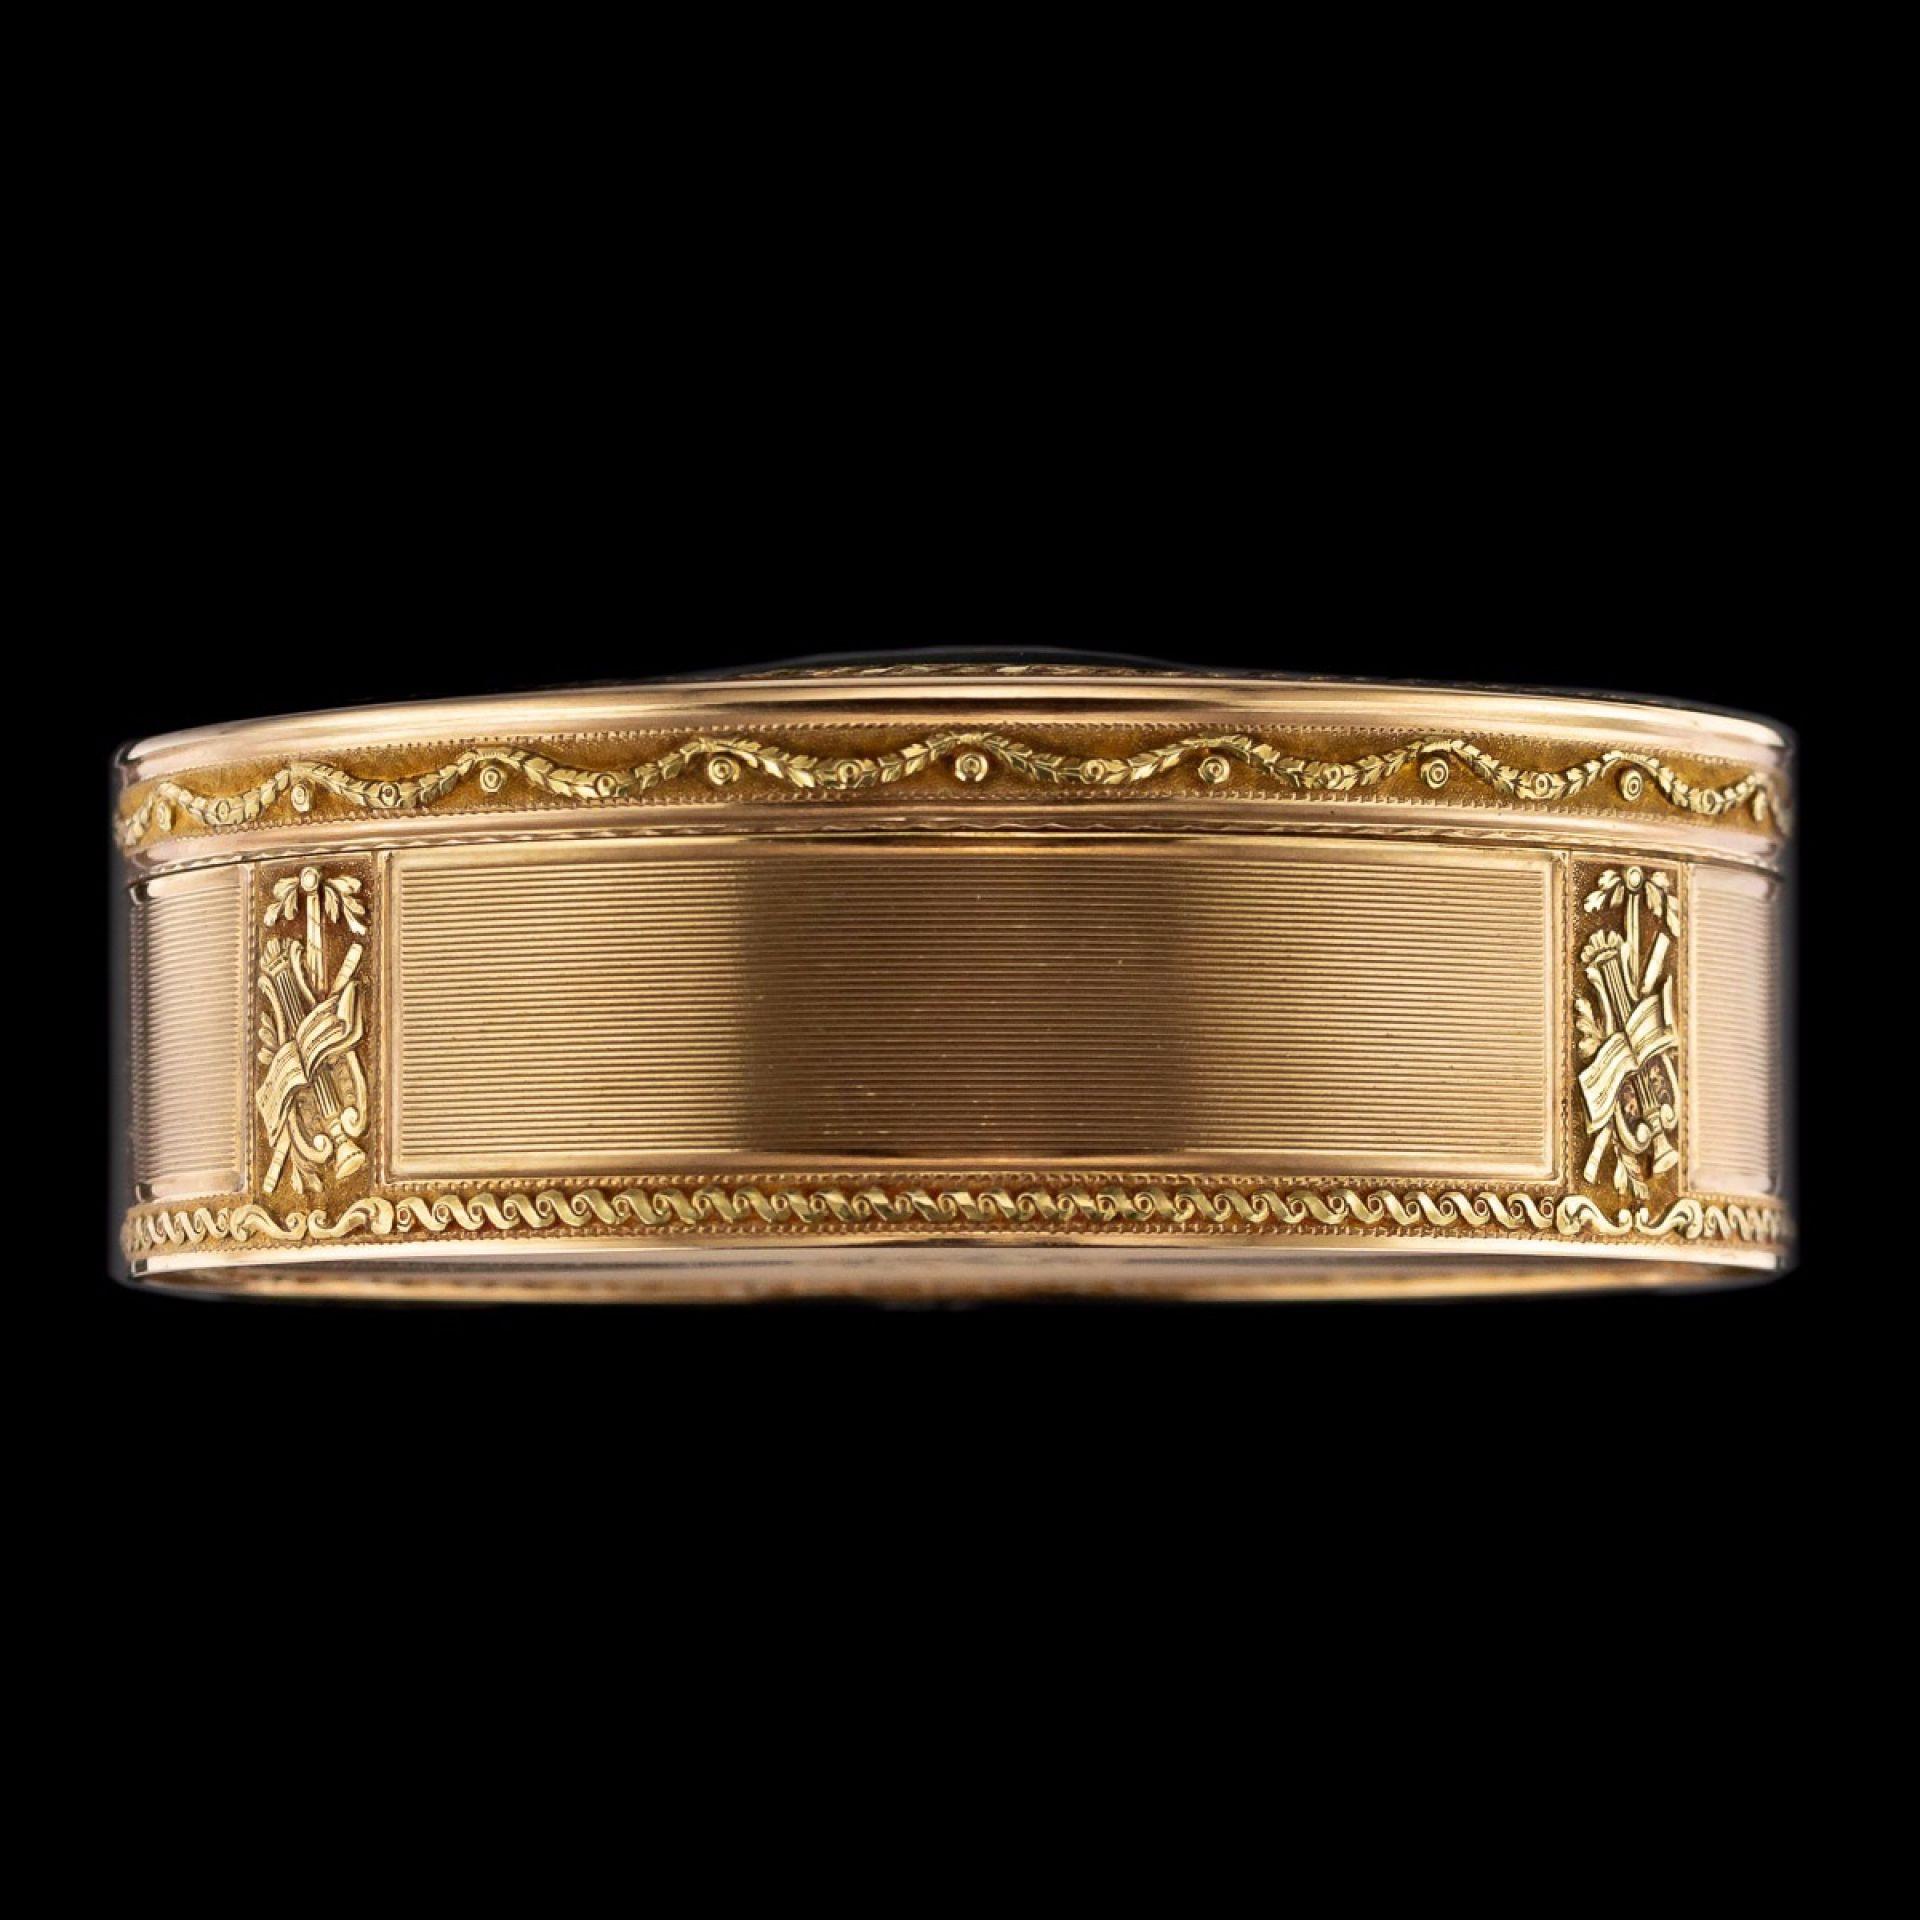 ANTIQUE 18thC GERMAN 18k GOLD SNUFF BOX, ESAIS FERNAU, HANAU c.1790